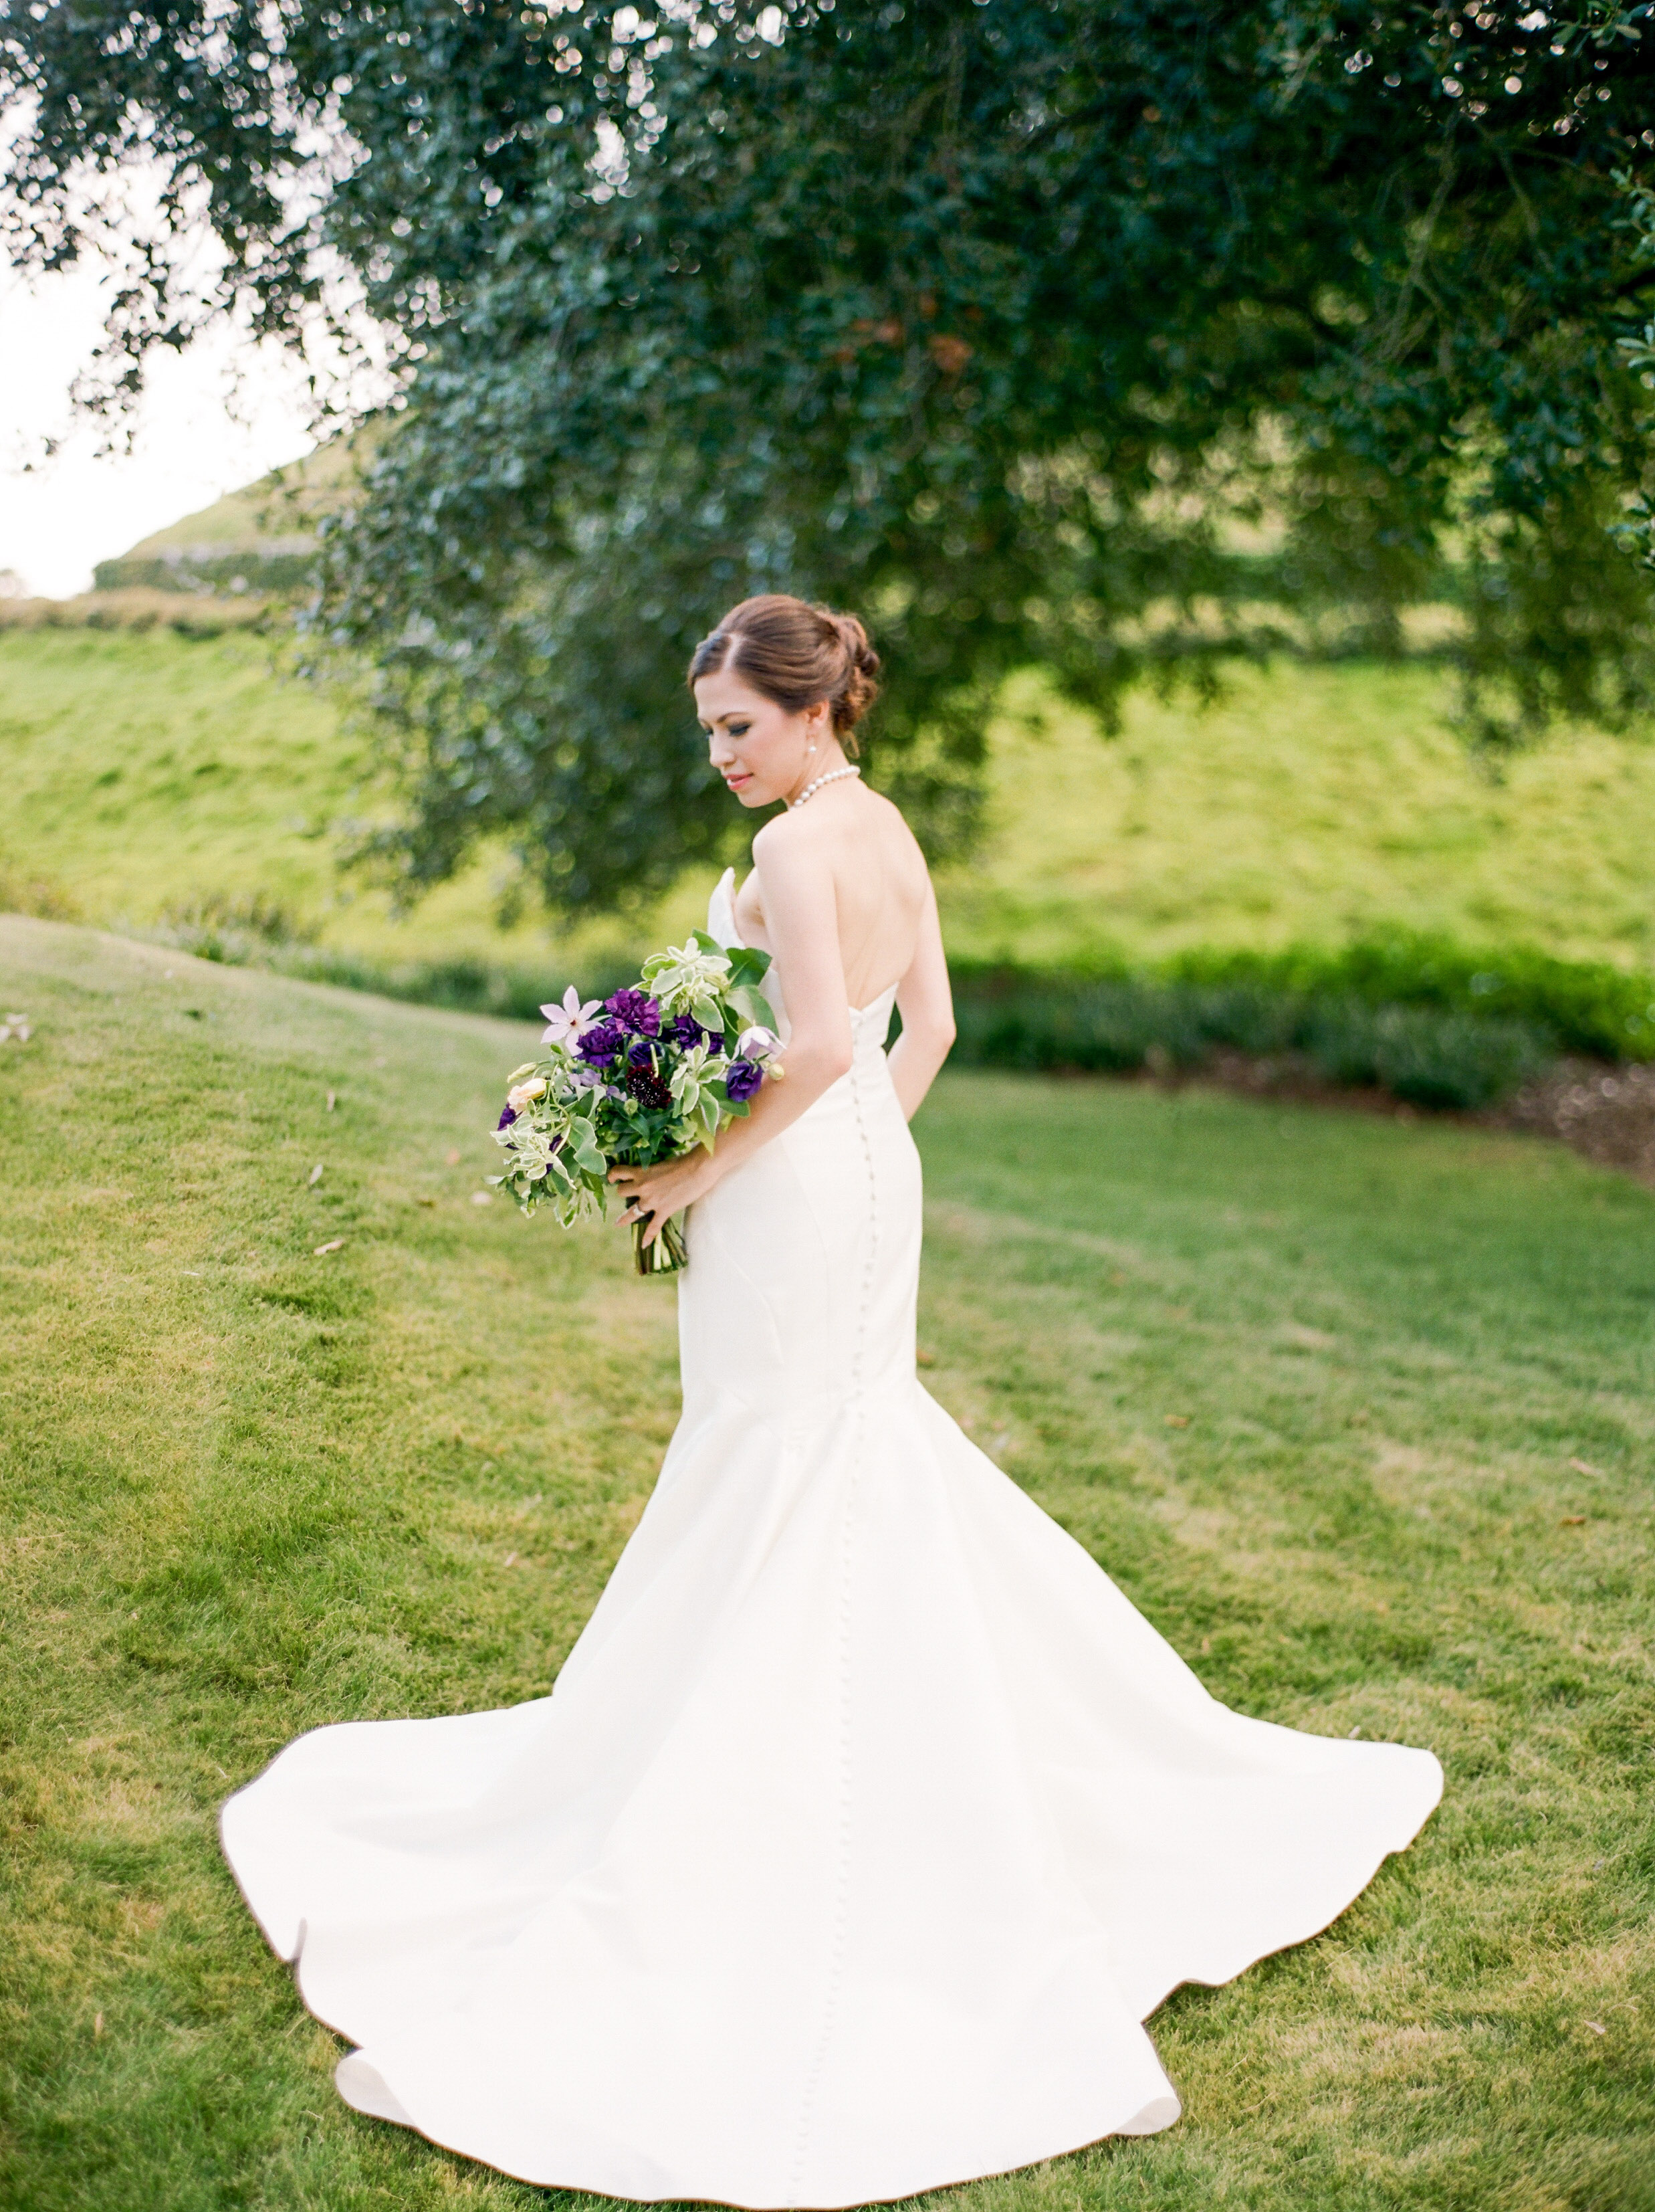 mcgovern-centennial-gardens-wedding-houston-wedding-photographer-bridals-film-austin-wedding-photographer-1.jpg